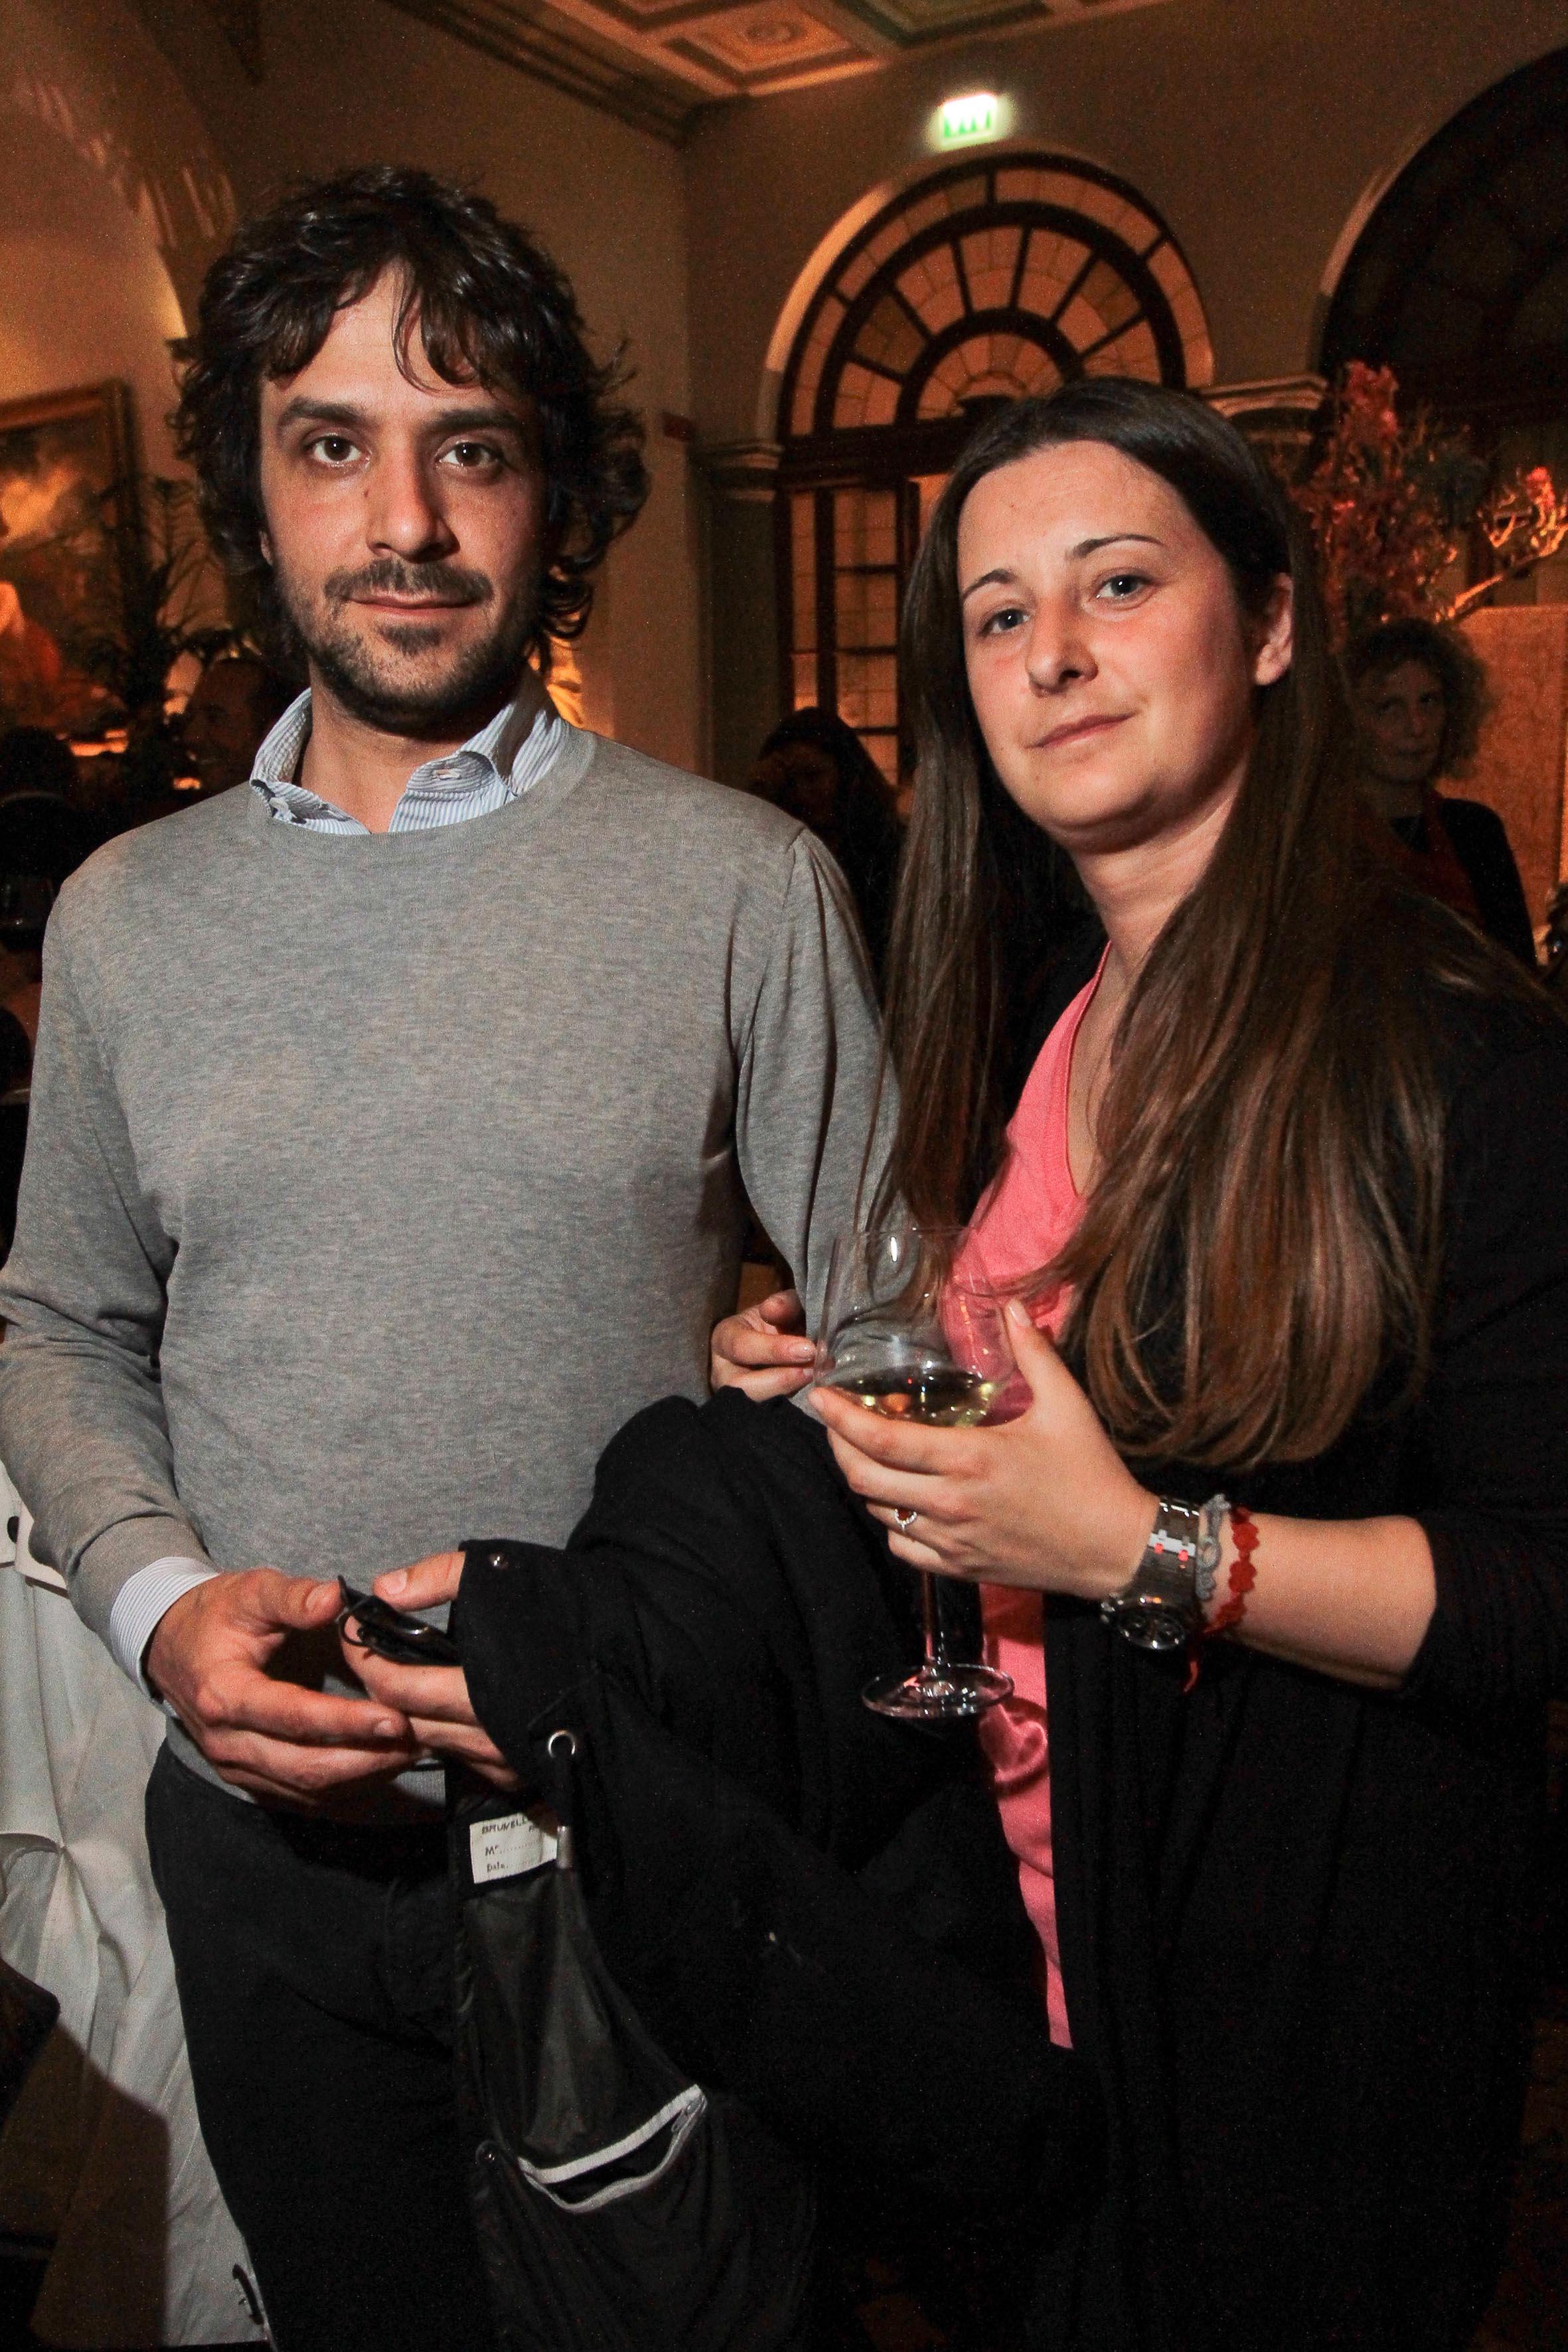 PRESSPHOTO Firenze, Hotel St Regis, serata Firenze Made in Tuscany. Nella foto  Giacomo Romoli e Erica Zuliani Giuseppe Cabras/New Press Photo